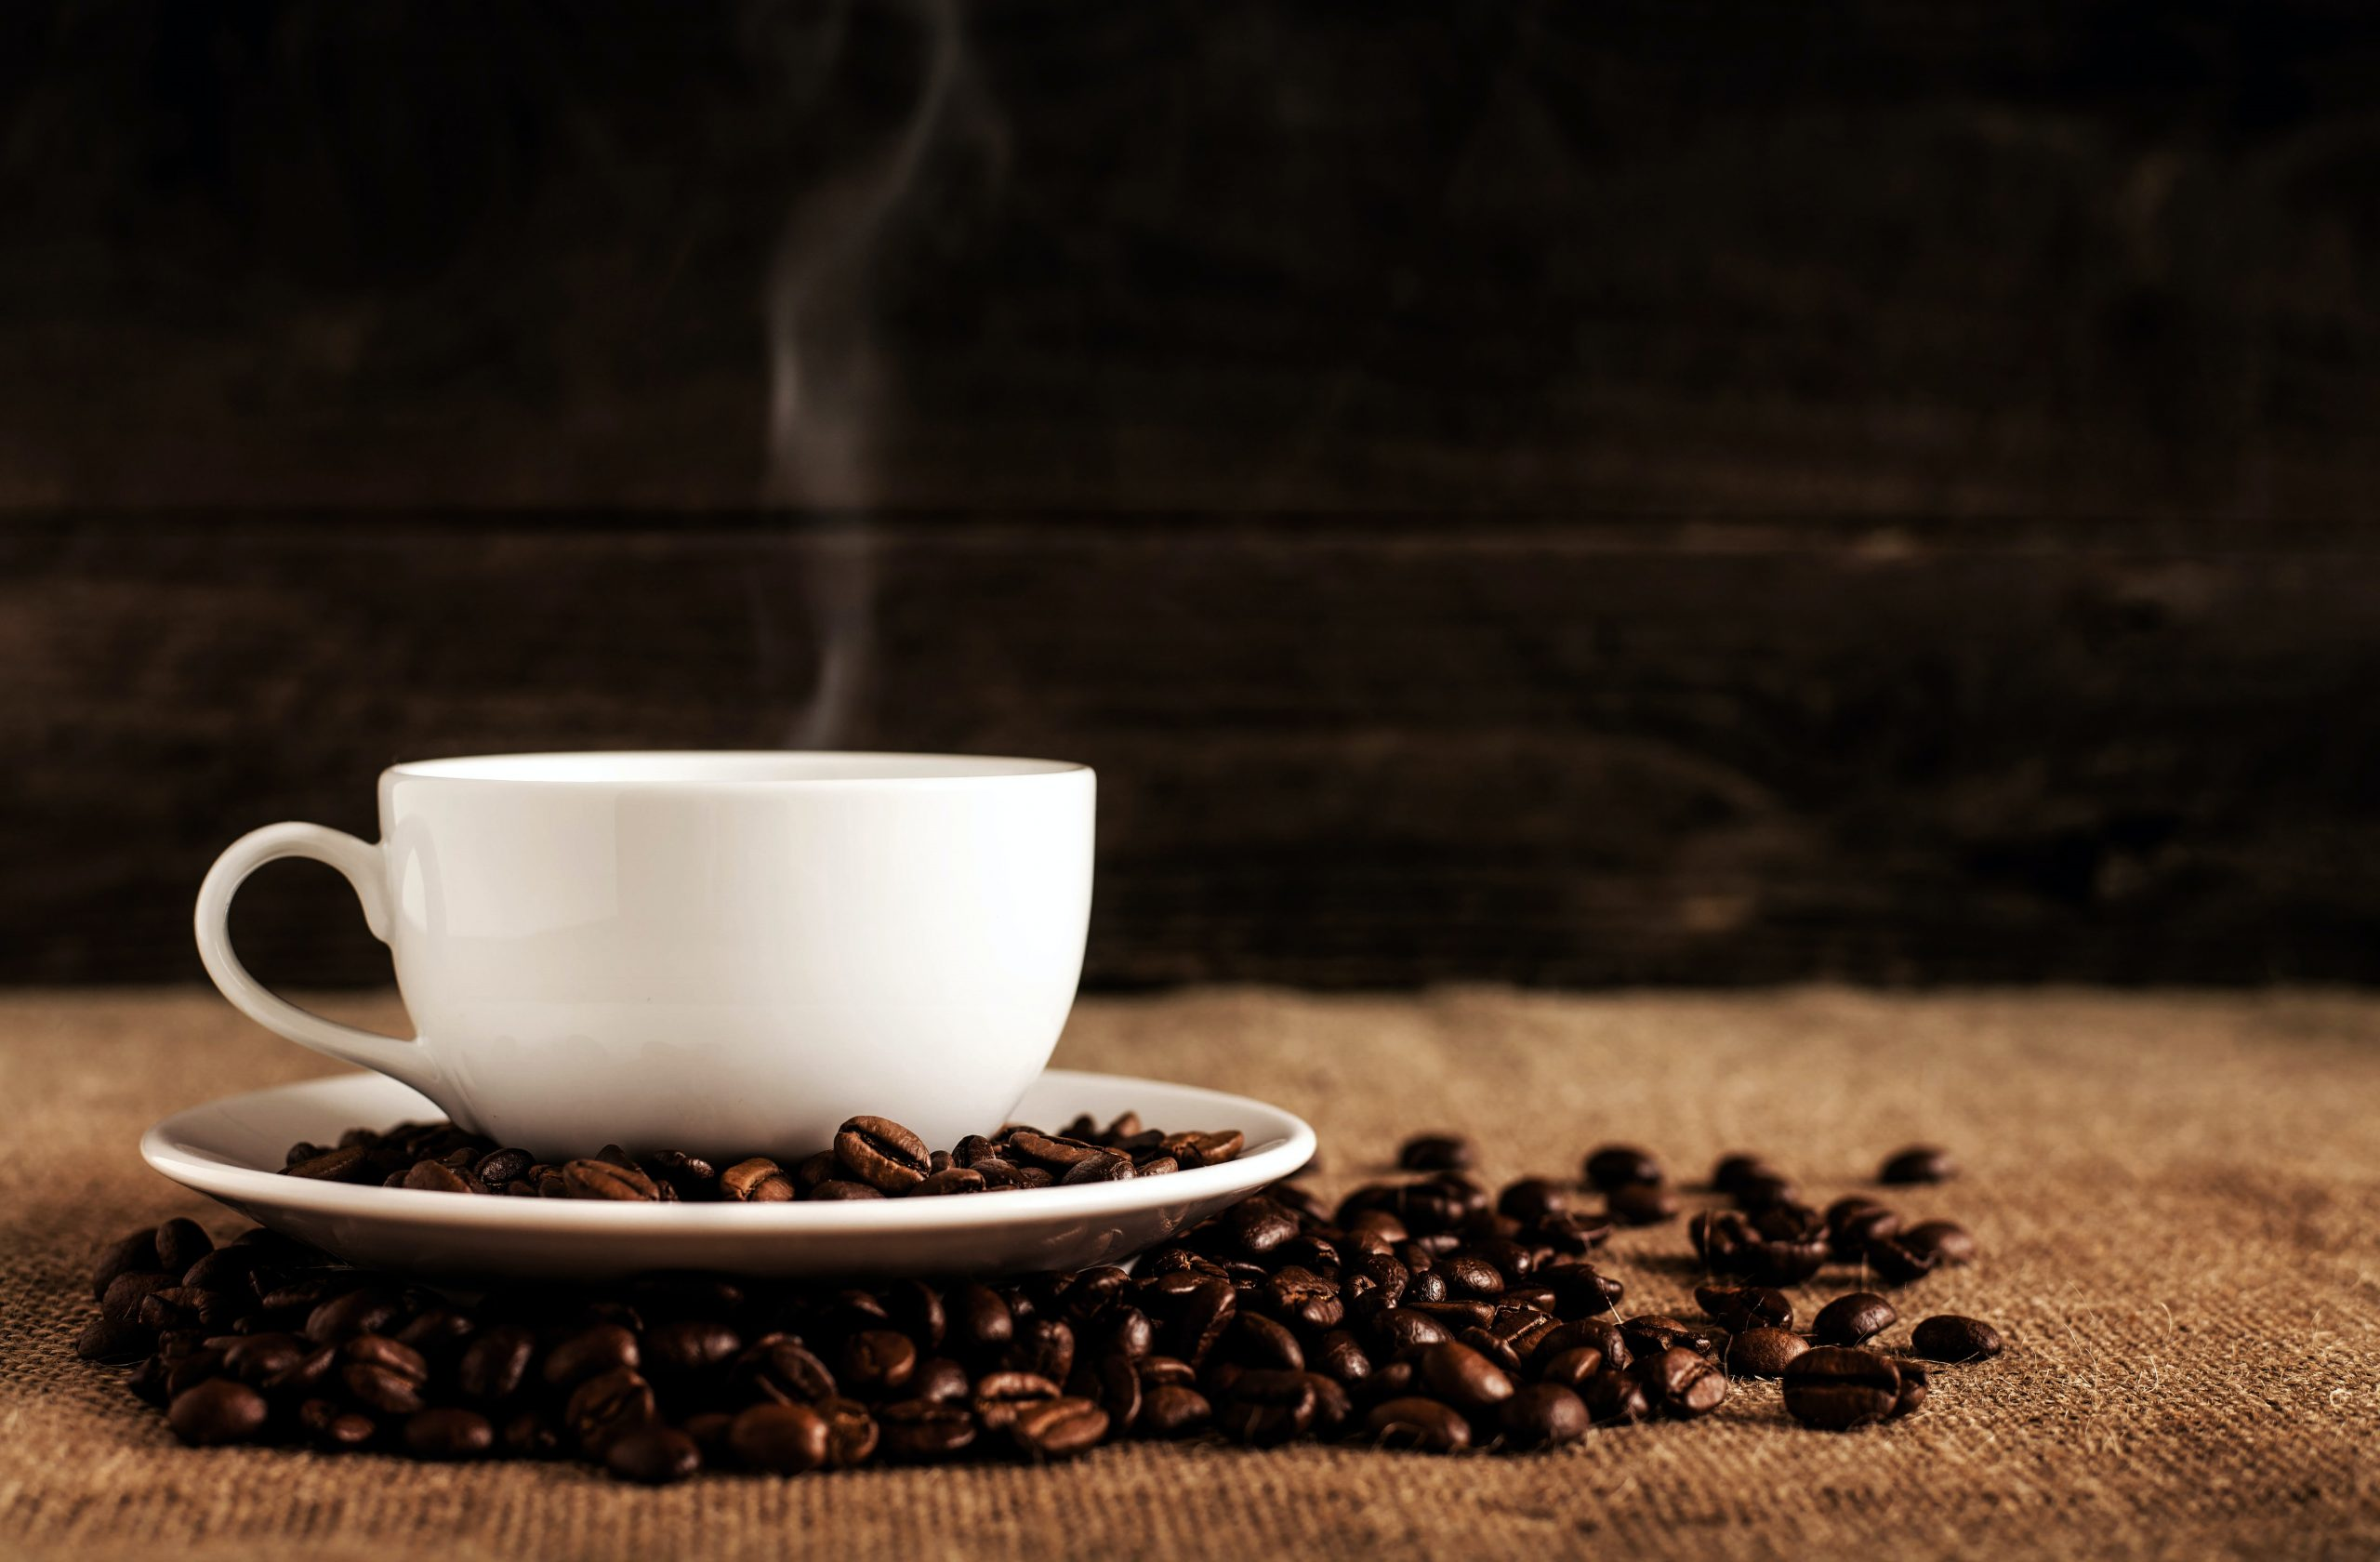 industri kaffemaskine